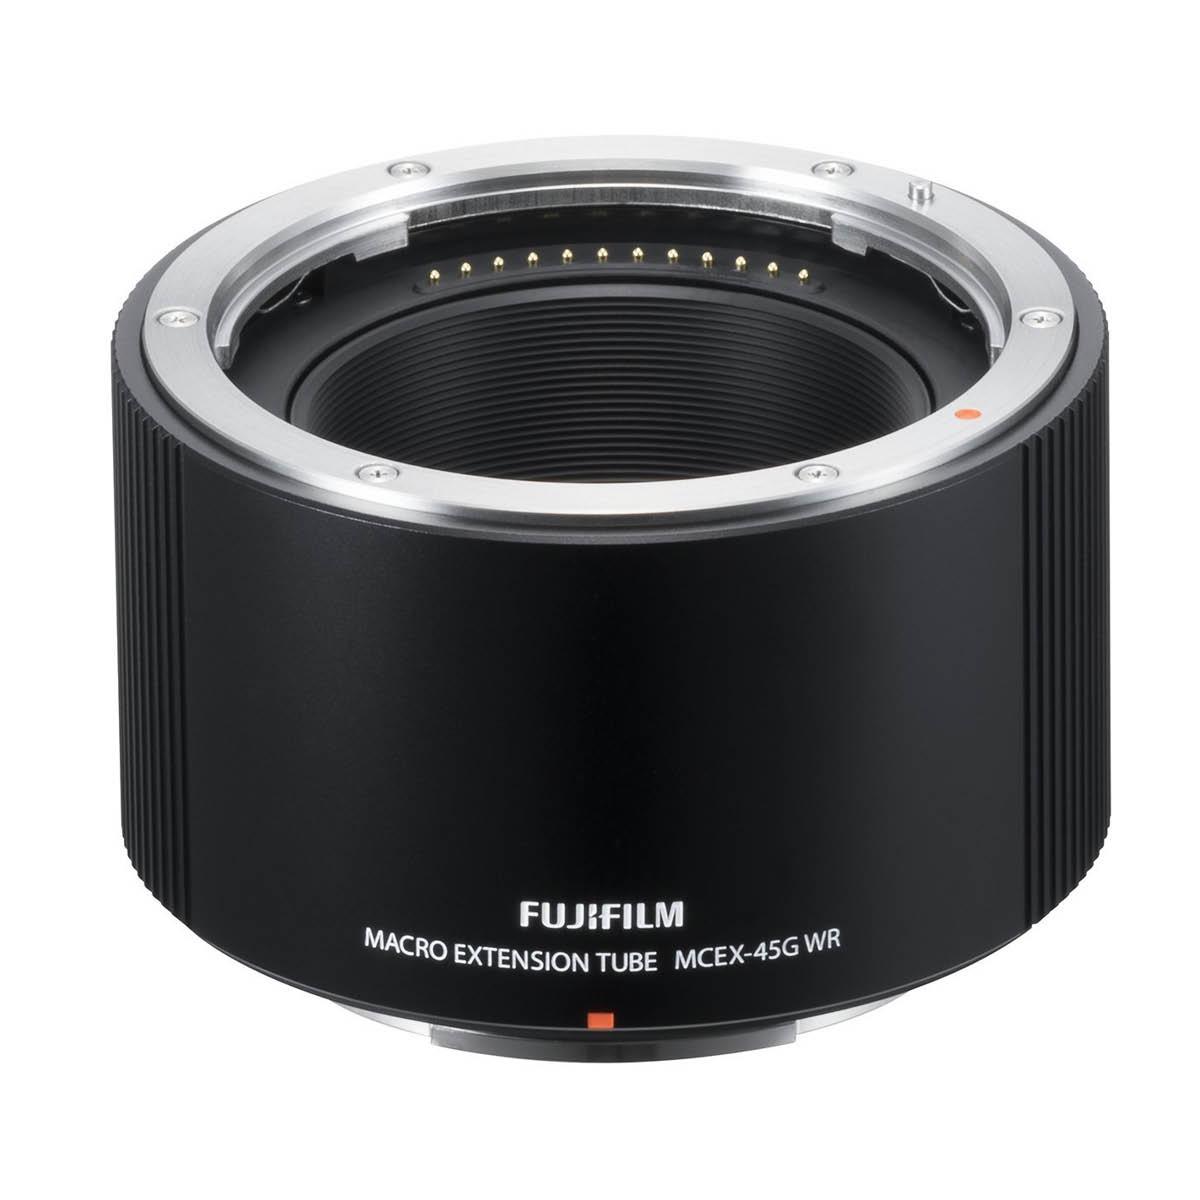 Fujifilm MCEX 45 G WR Makroring